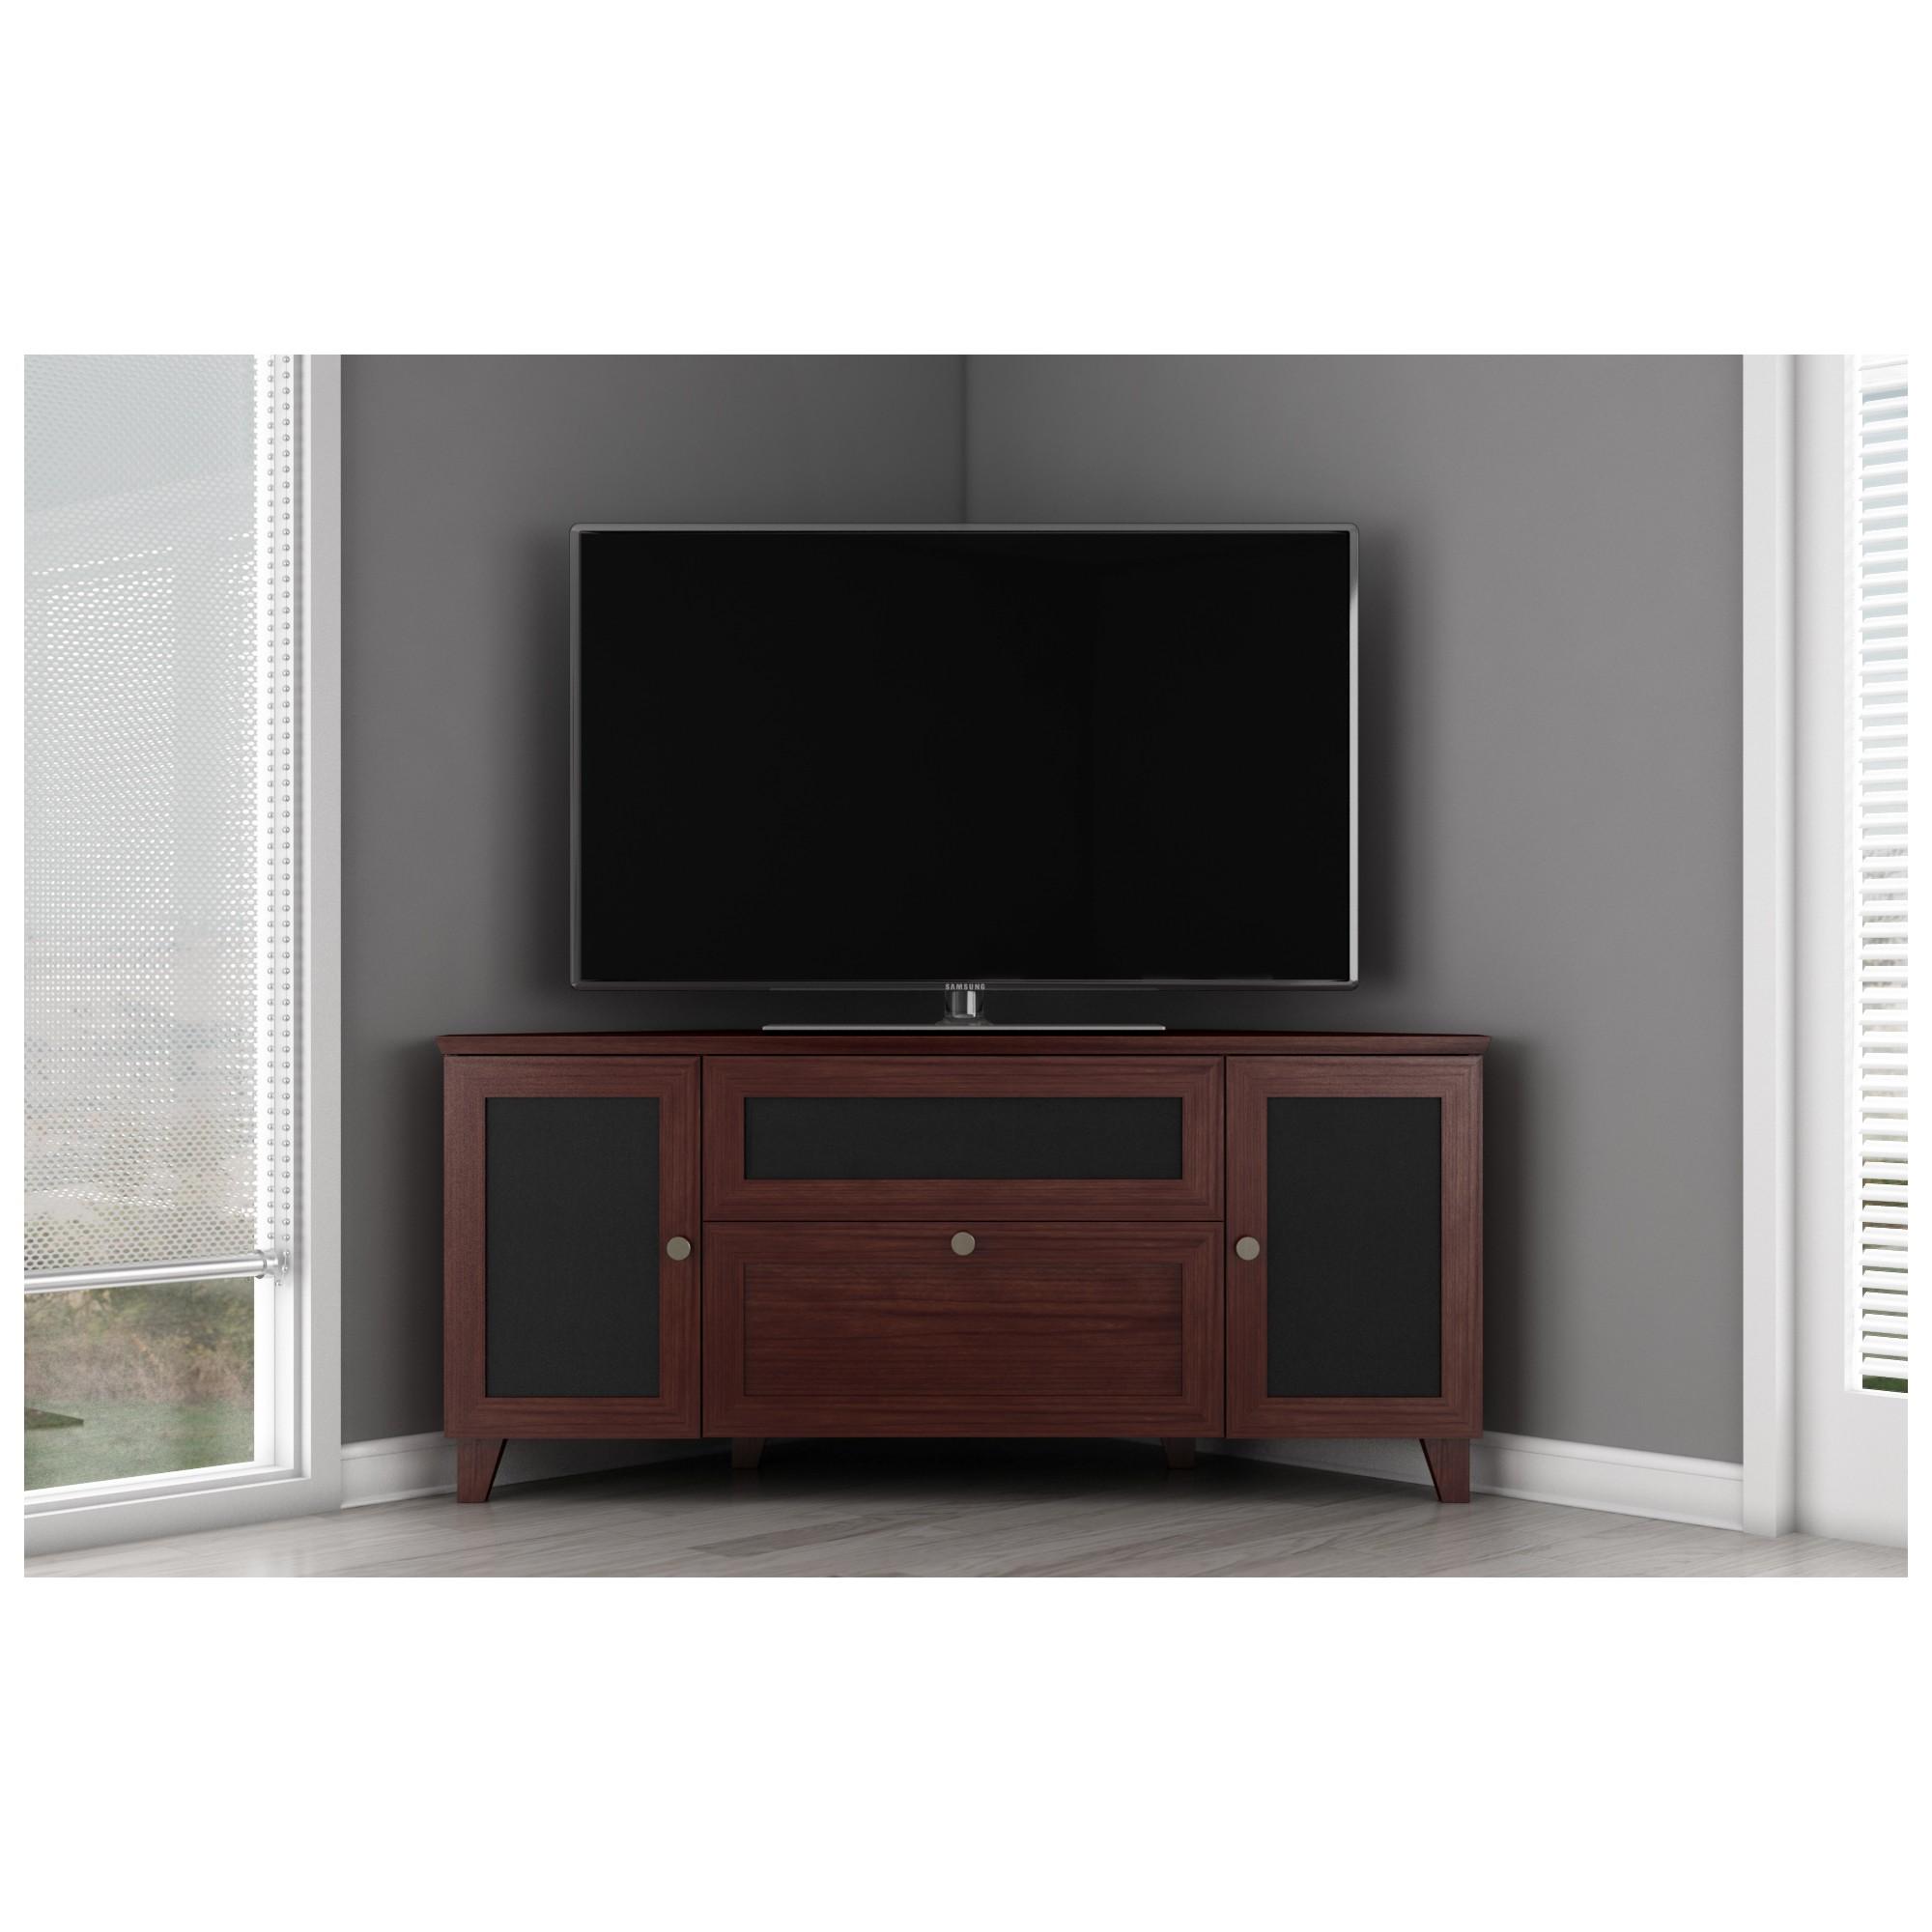 Furnitech FT61SCC-DC 61  TV Stand Shaker Corner Media Cabinet w/ Center Speaker Opening Cherry  sc 1 st  Dynamic Home Decor & Furnitech FT61SCC-DC FT61SCC-DC 61